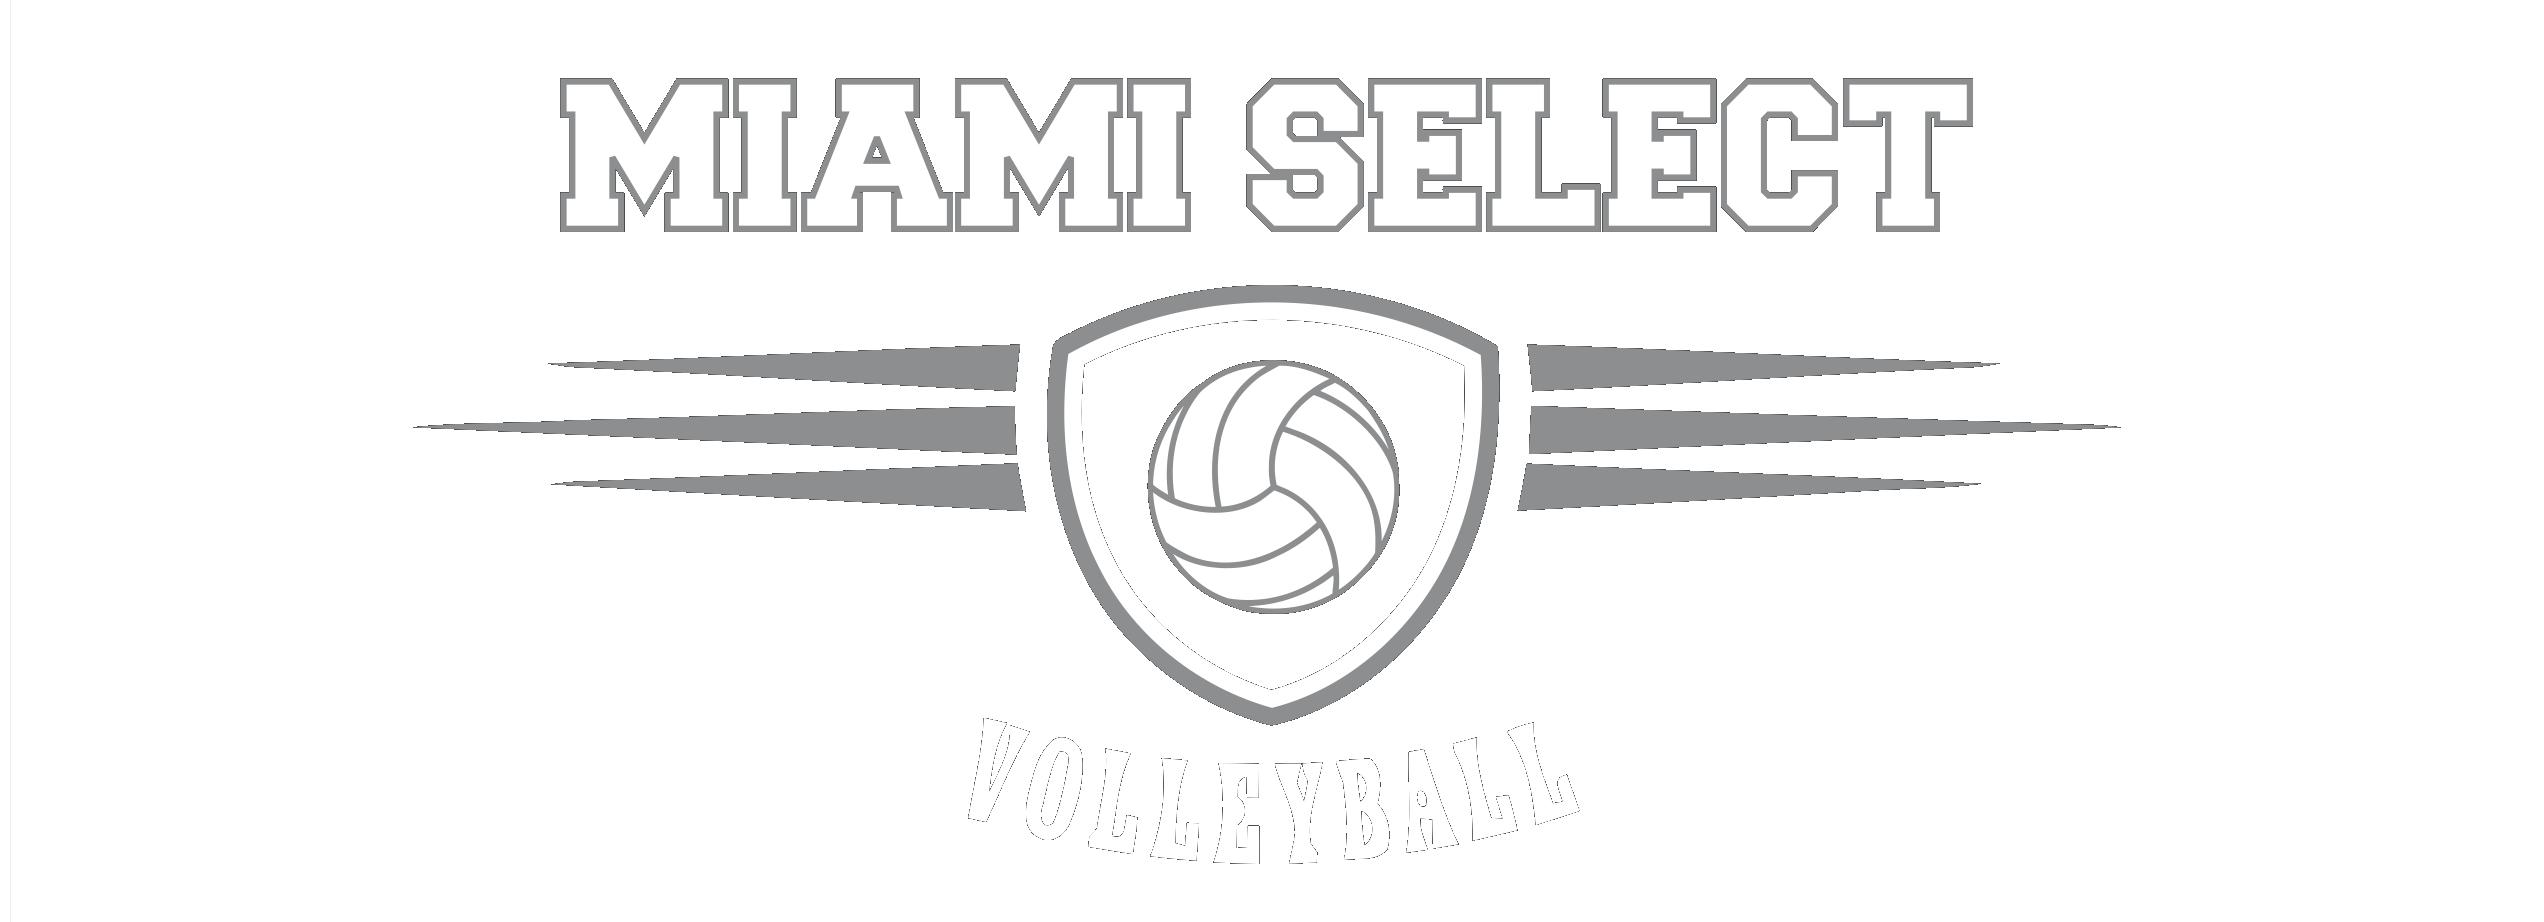 Miami select grey logo w white 2  dragged